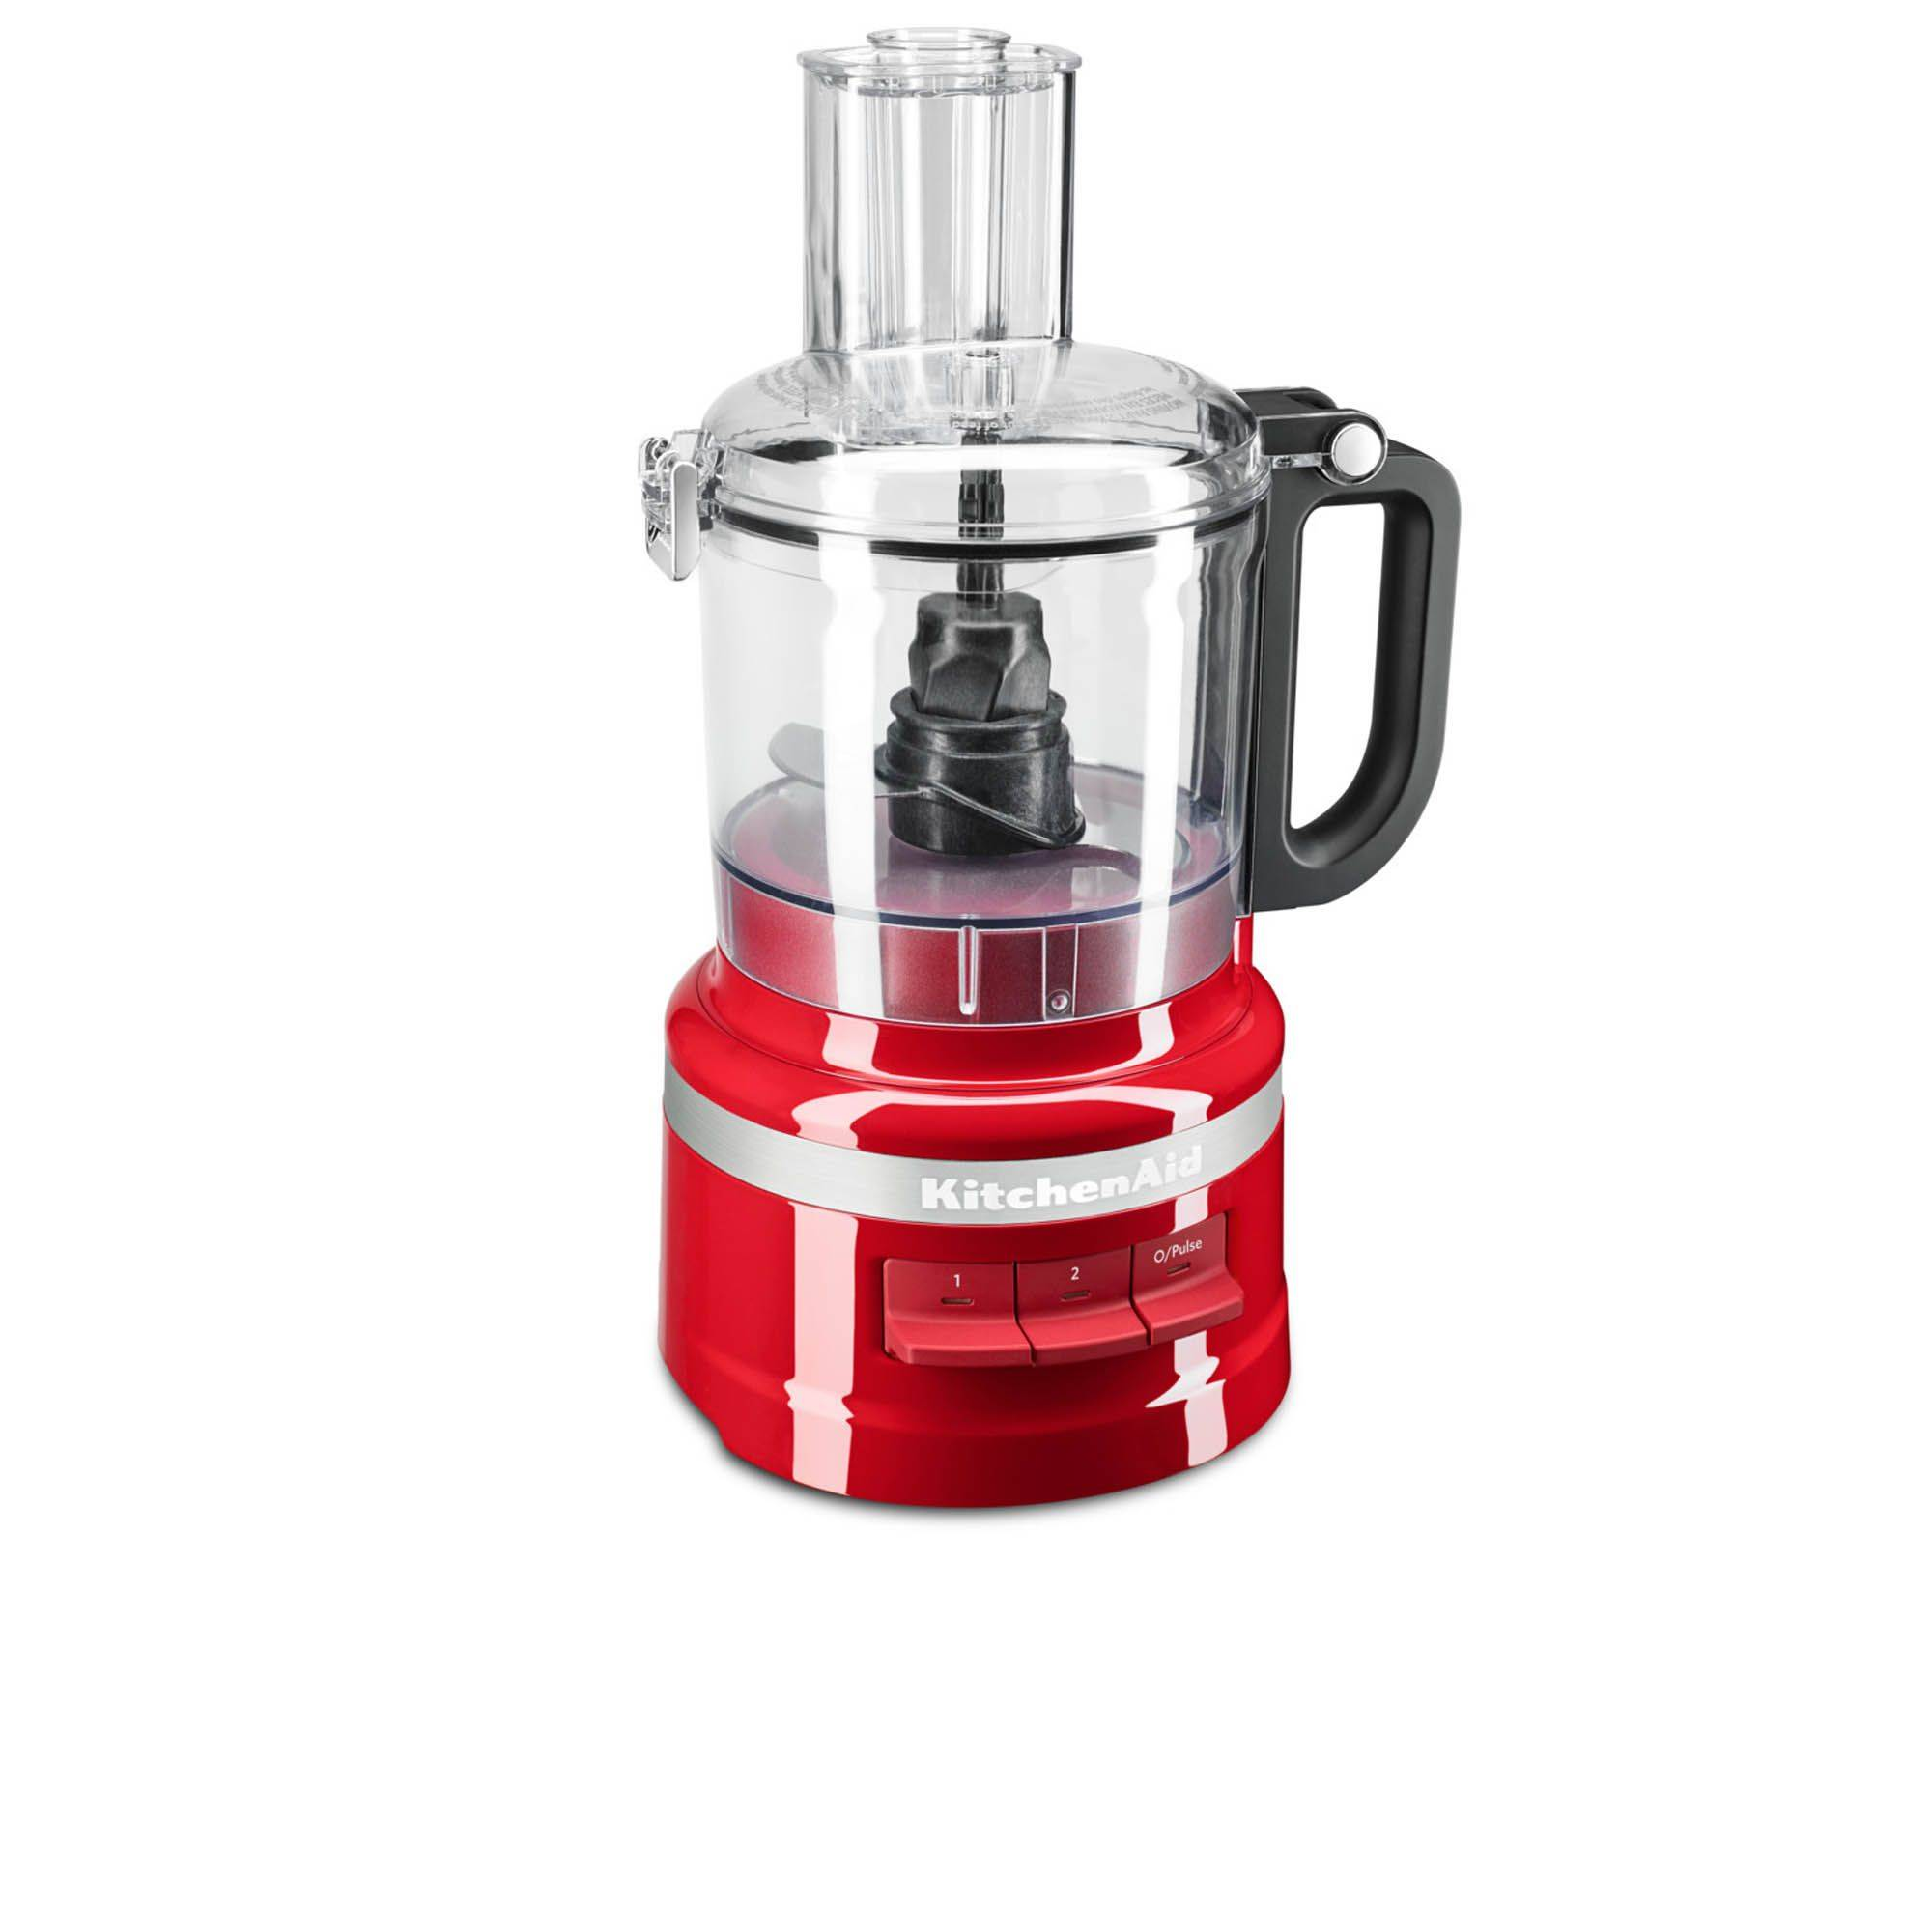 KitchenAid 5KFP0719EER robot da cucina con accessori